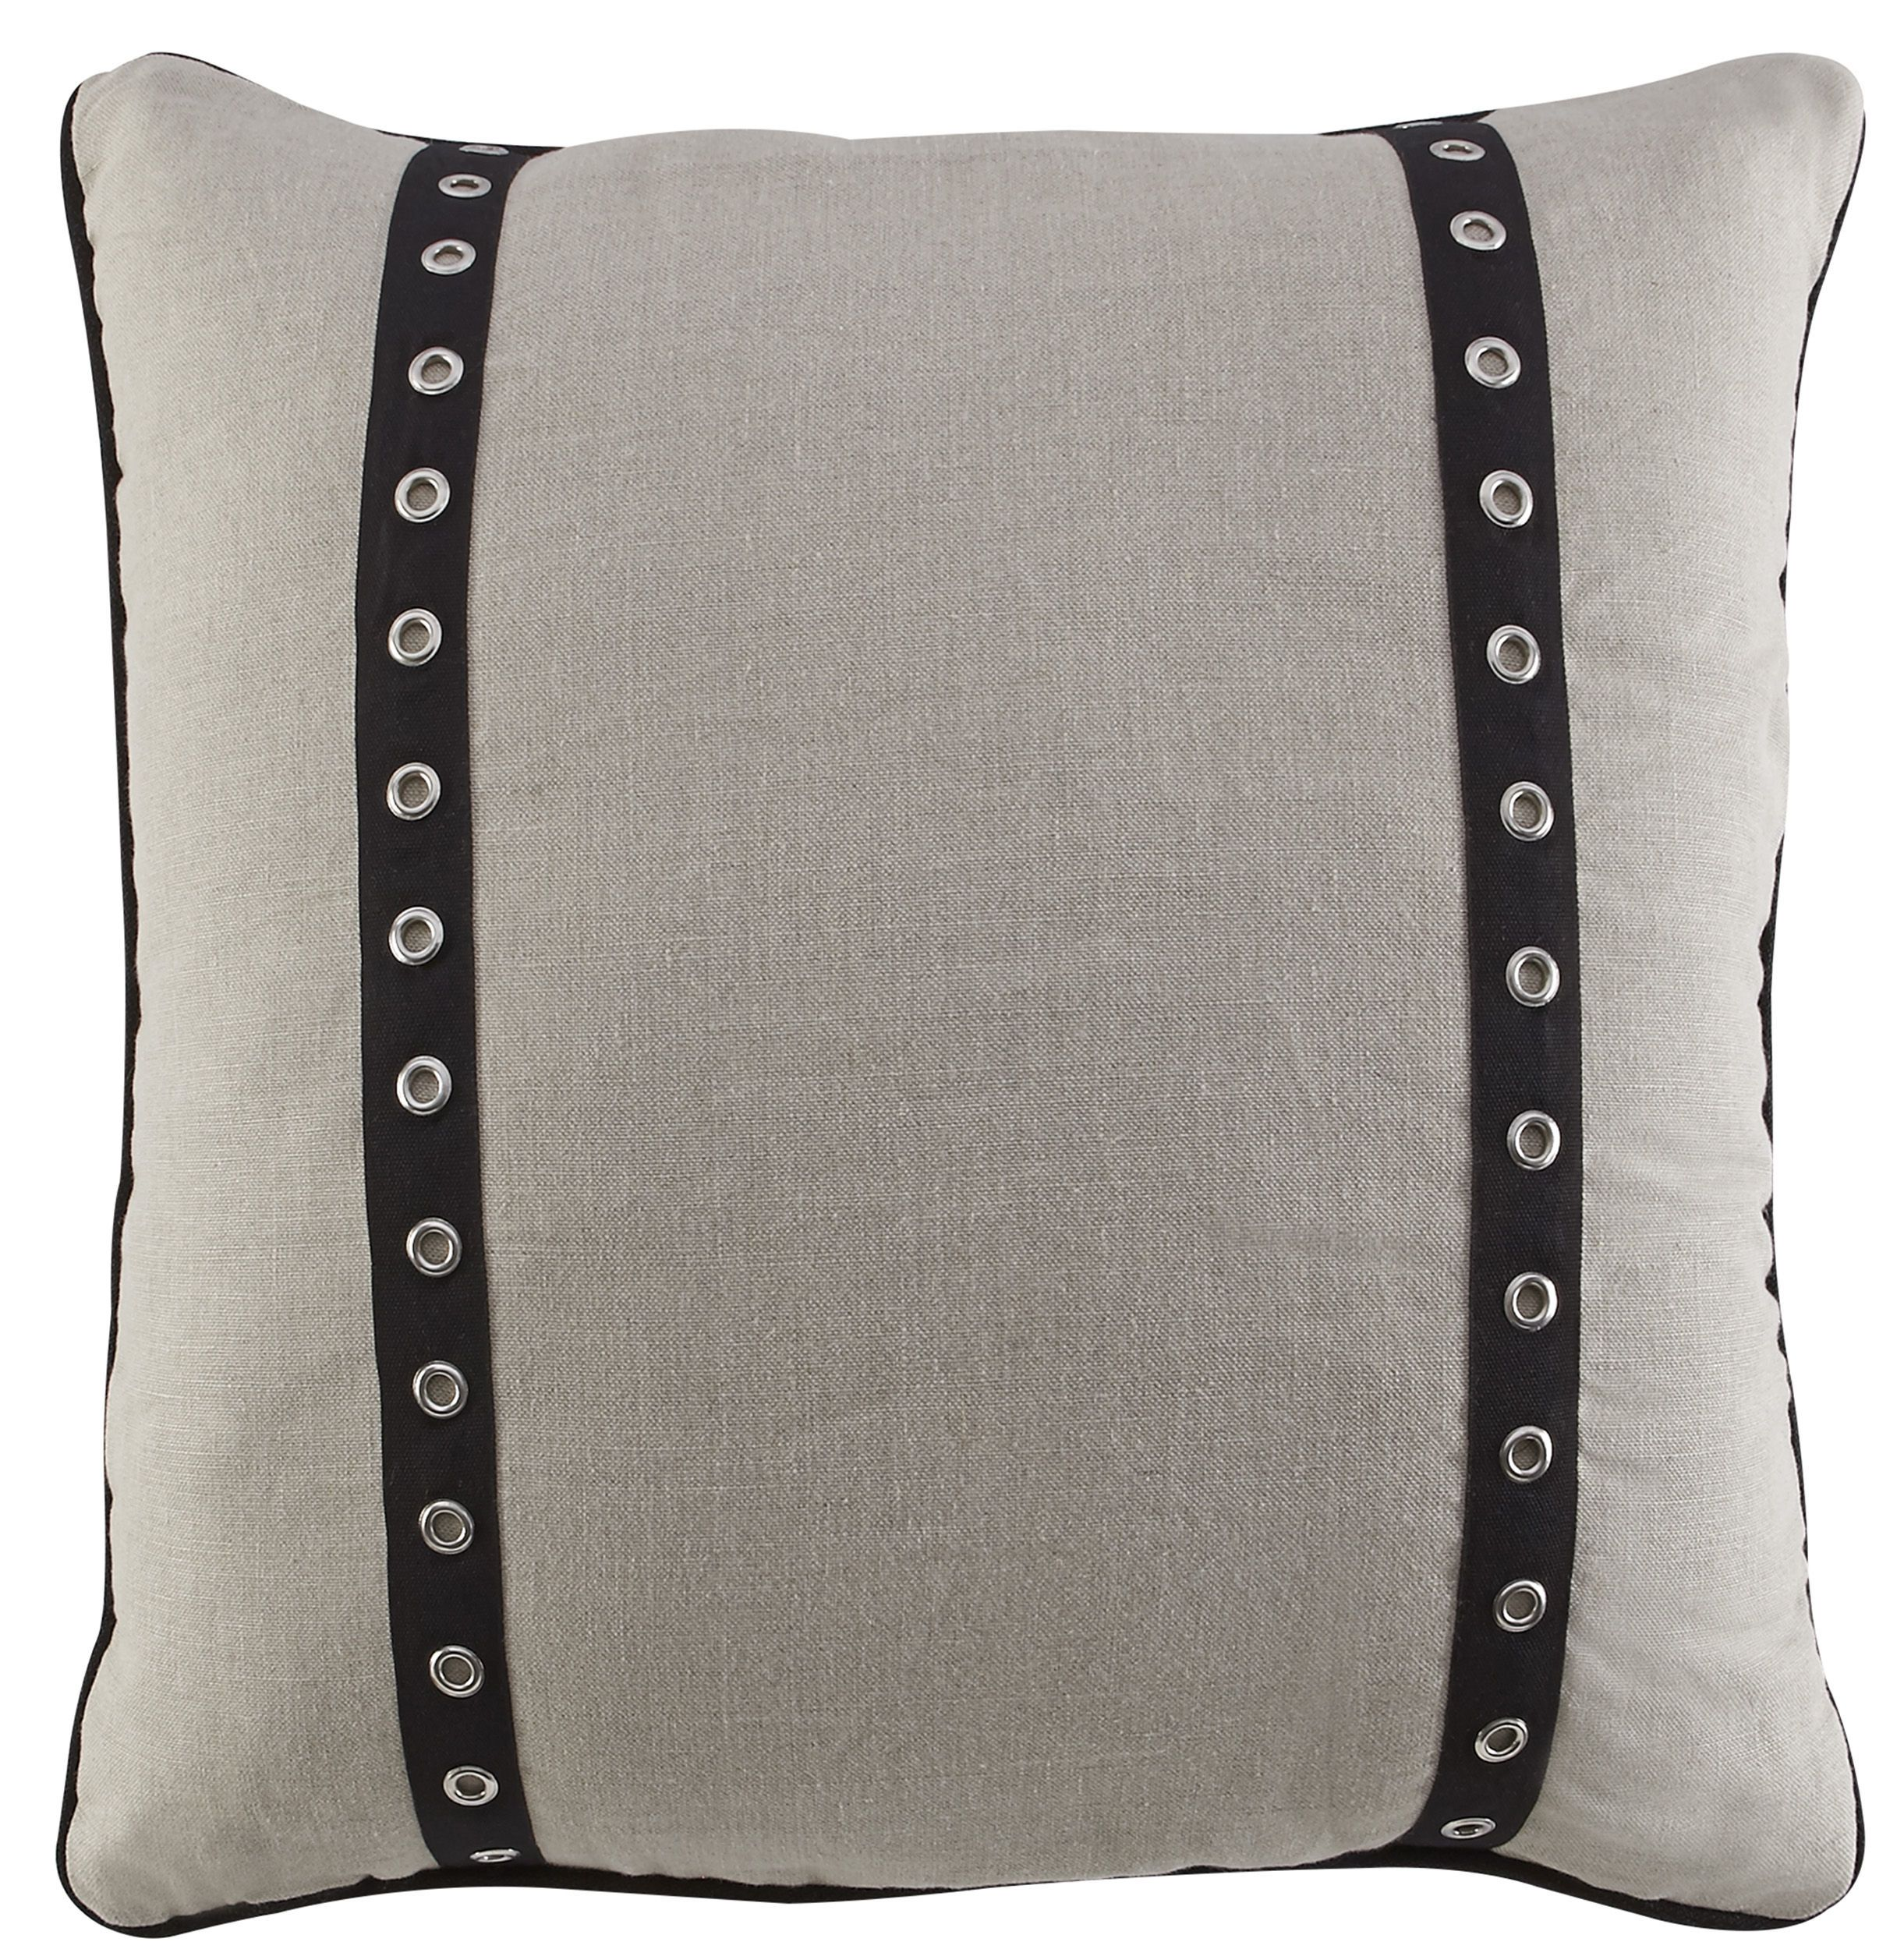 missoni store pillow la pynn pillows samantha for simons online pin maisonsimons simonsmaison maison at cushions